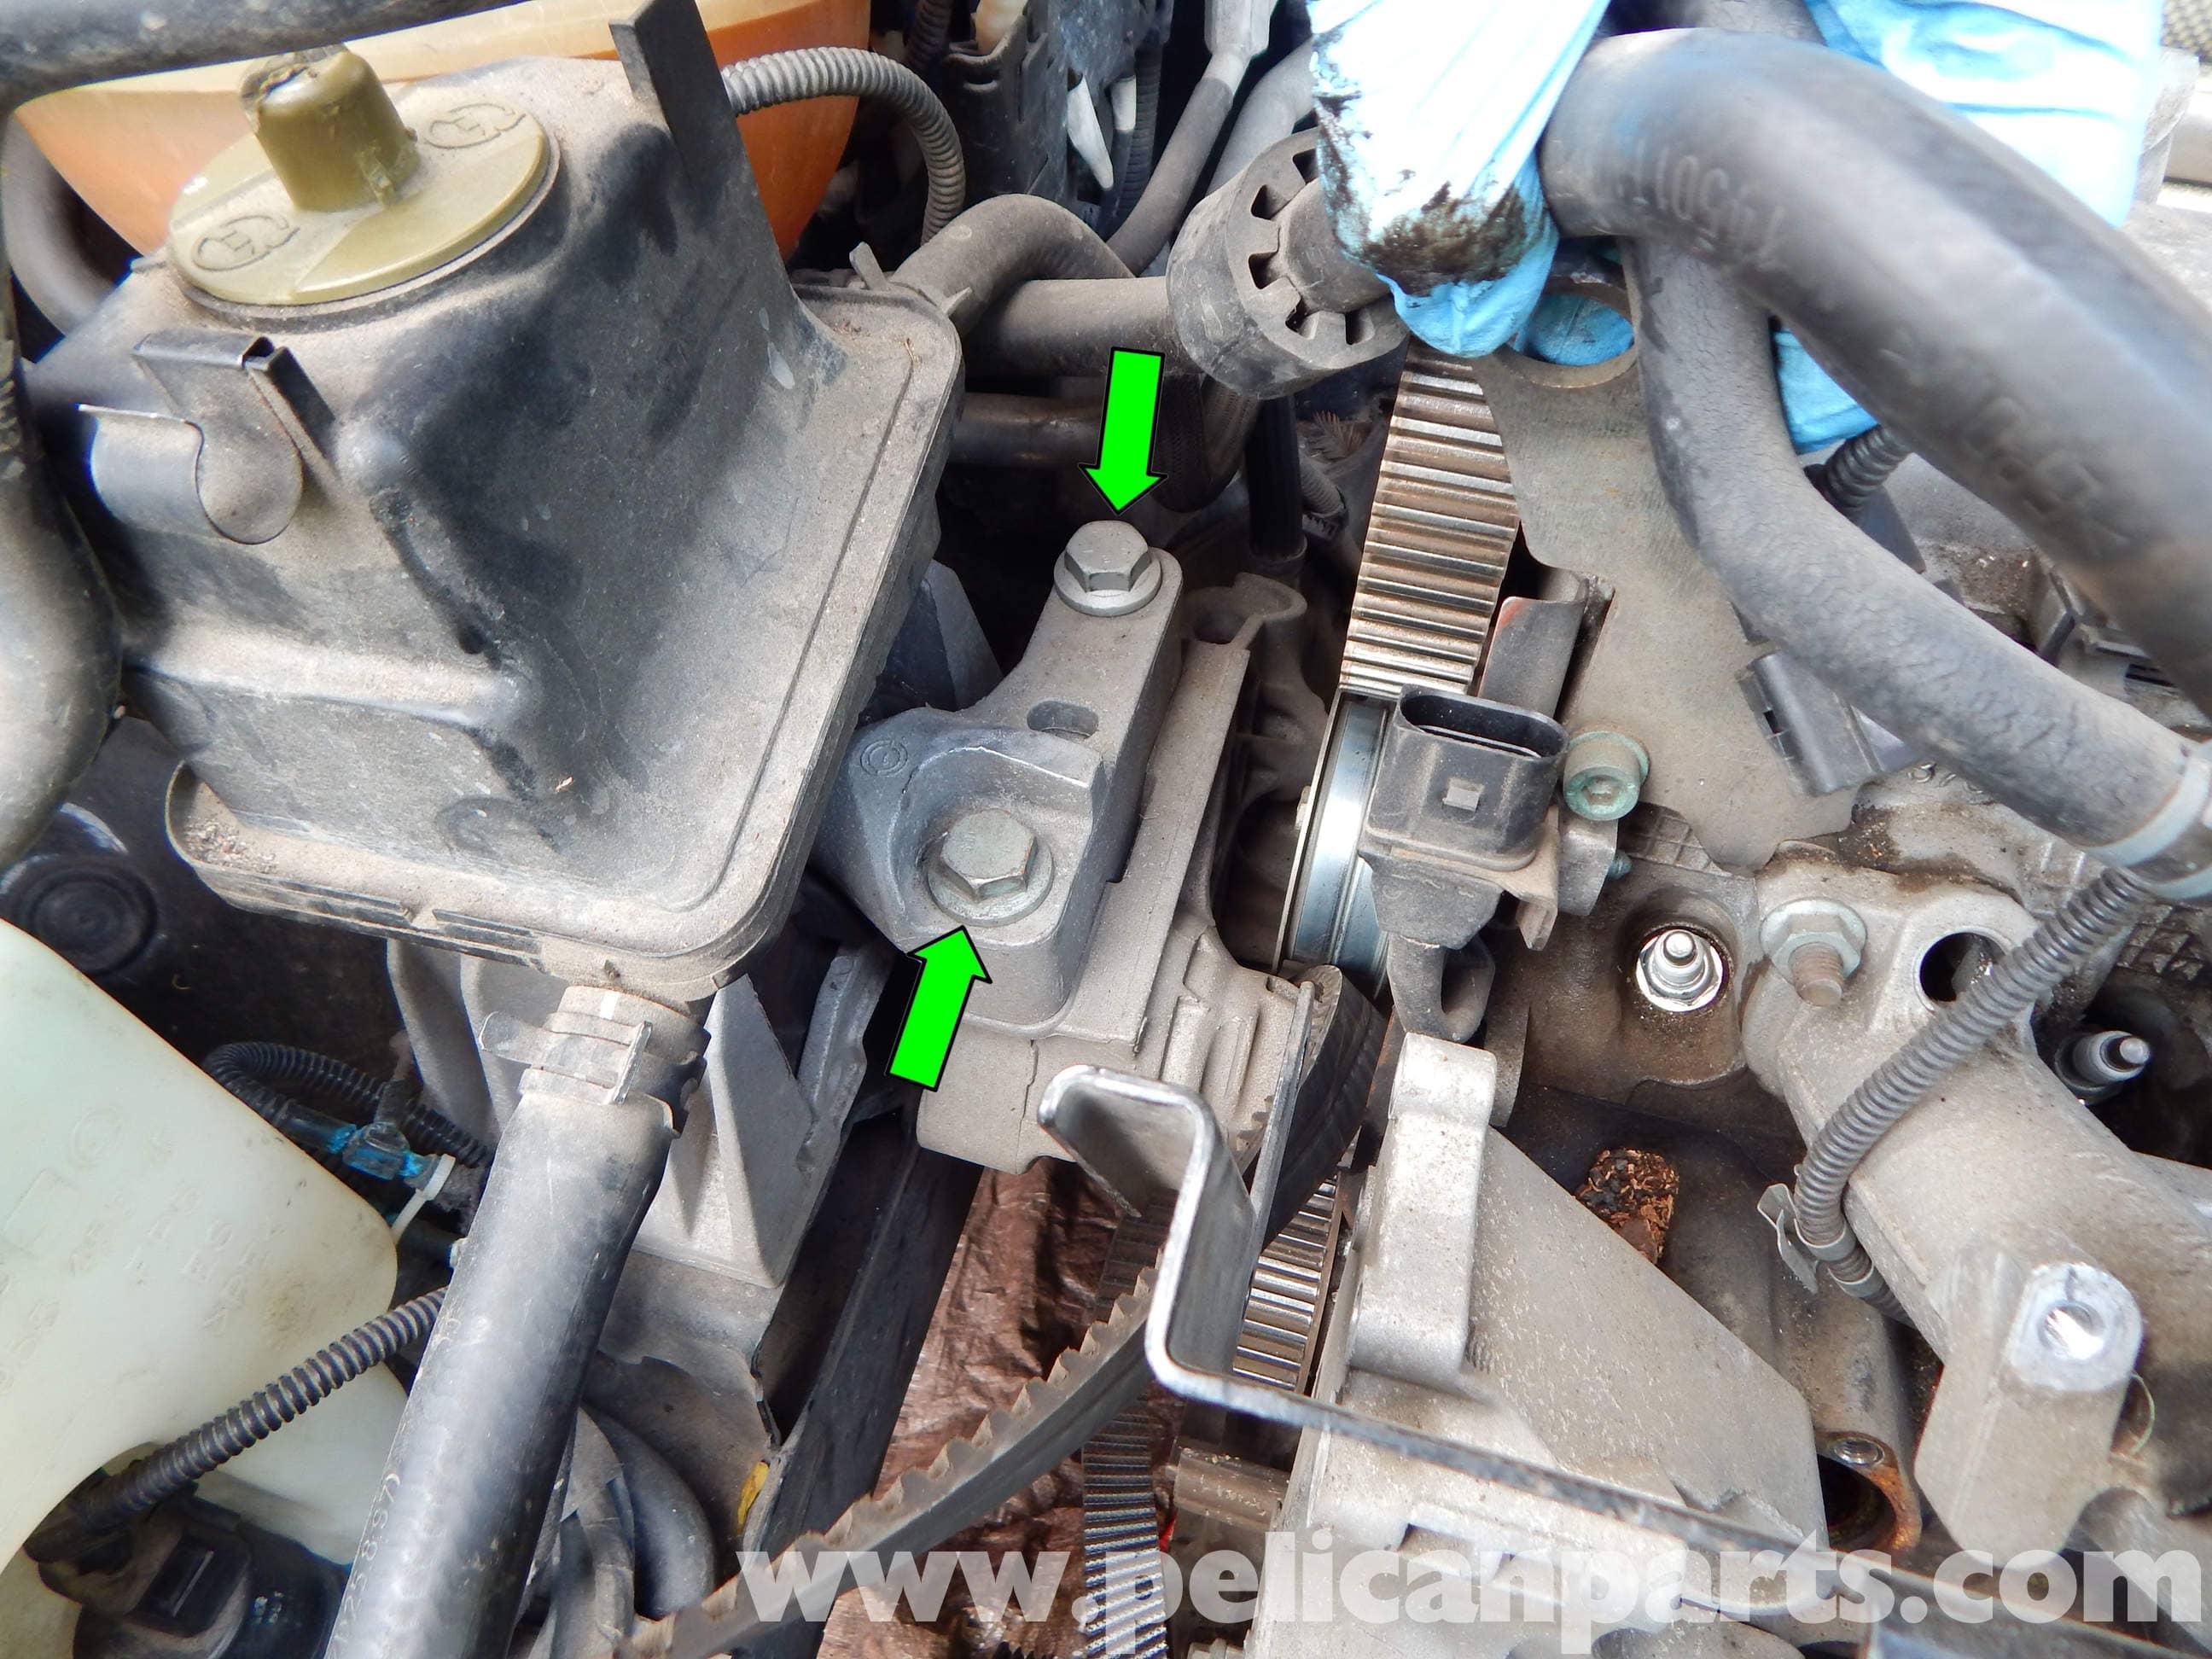 Volkswagen Jetta Mk4 Upper Engine Mount Replacement ...